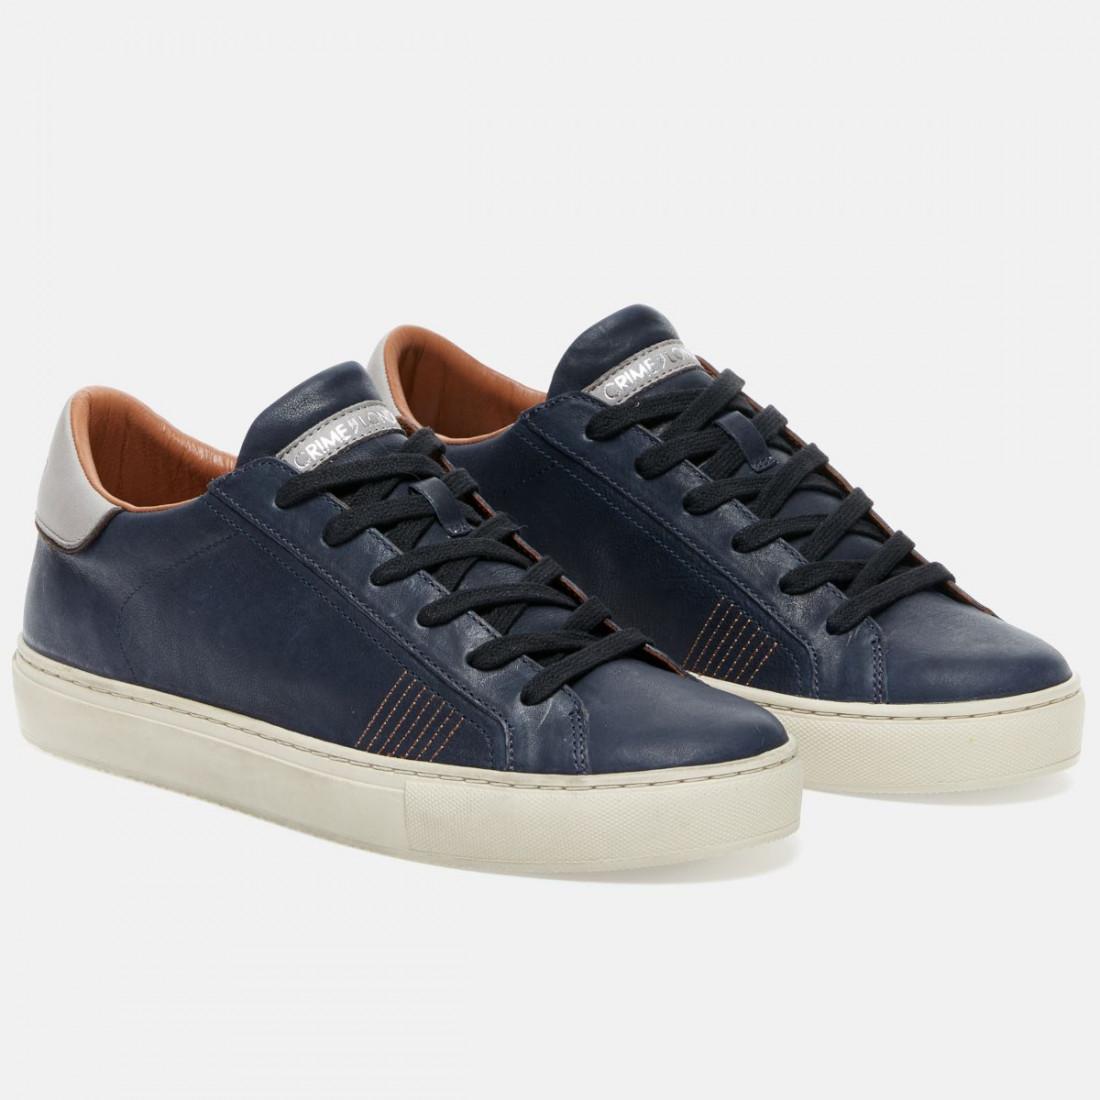 sneakers uomo crime london 10631navy 9144